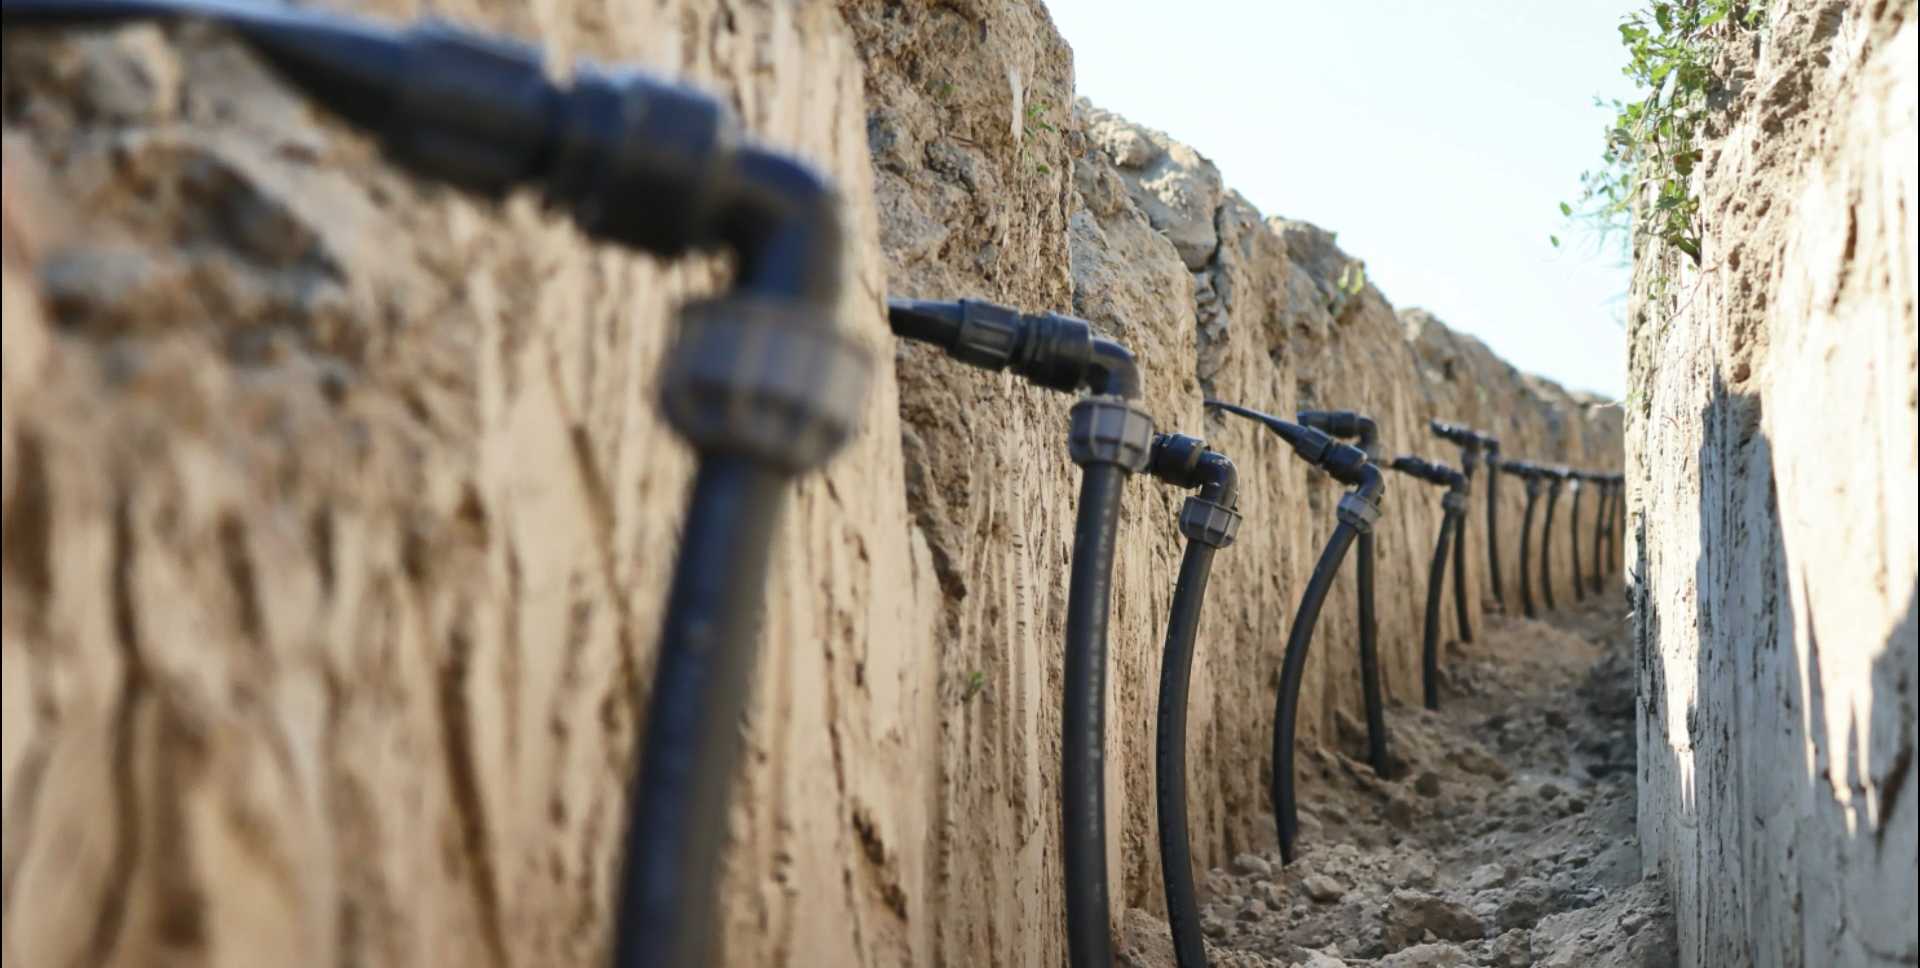 Sub-Irrigation